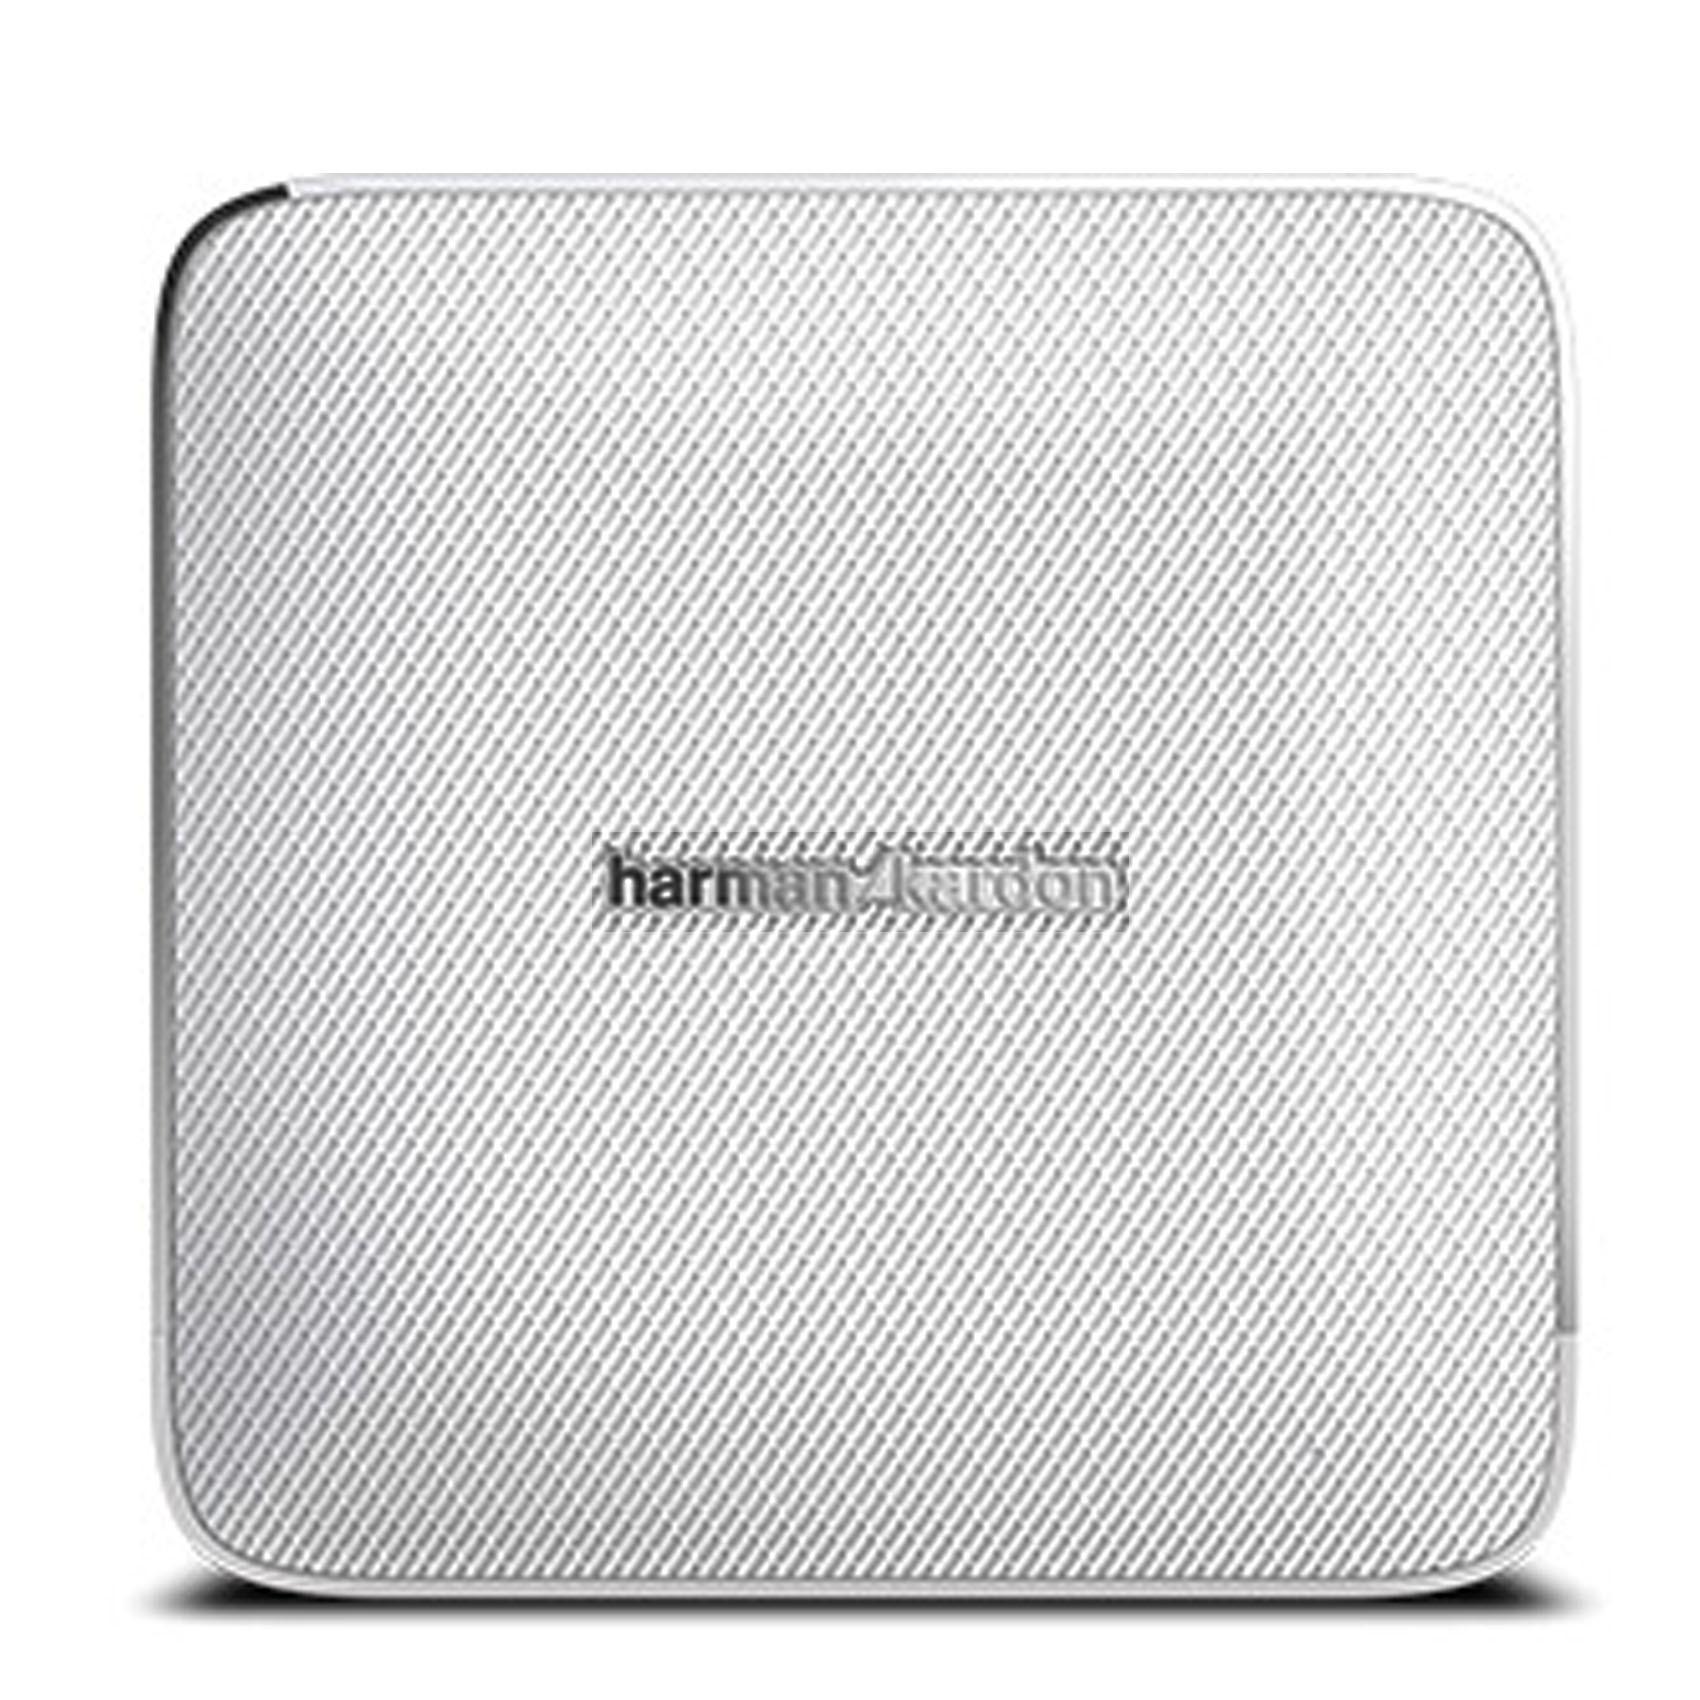 SPK NFC ESQUIRE WHT HARMAN